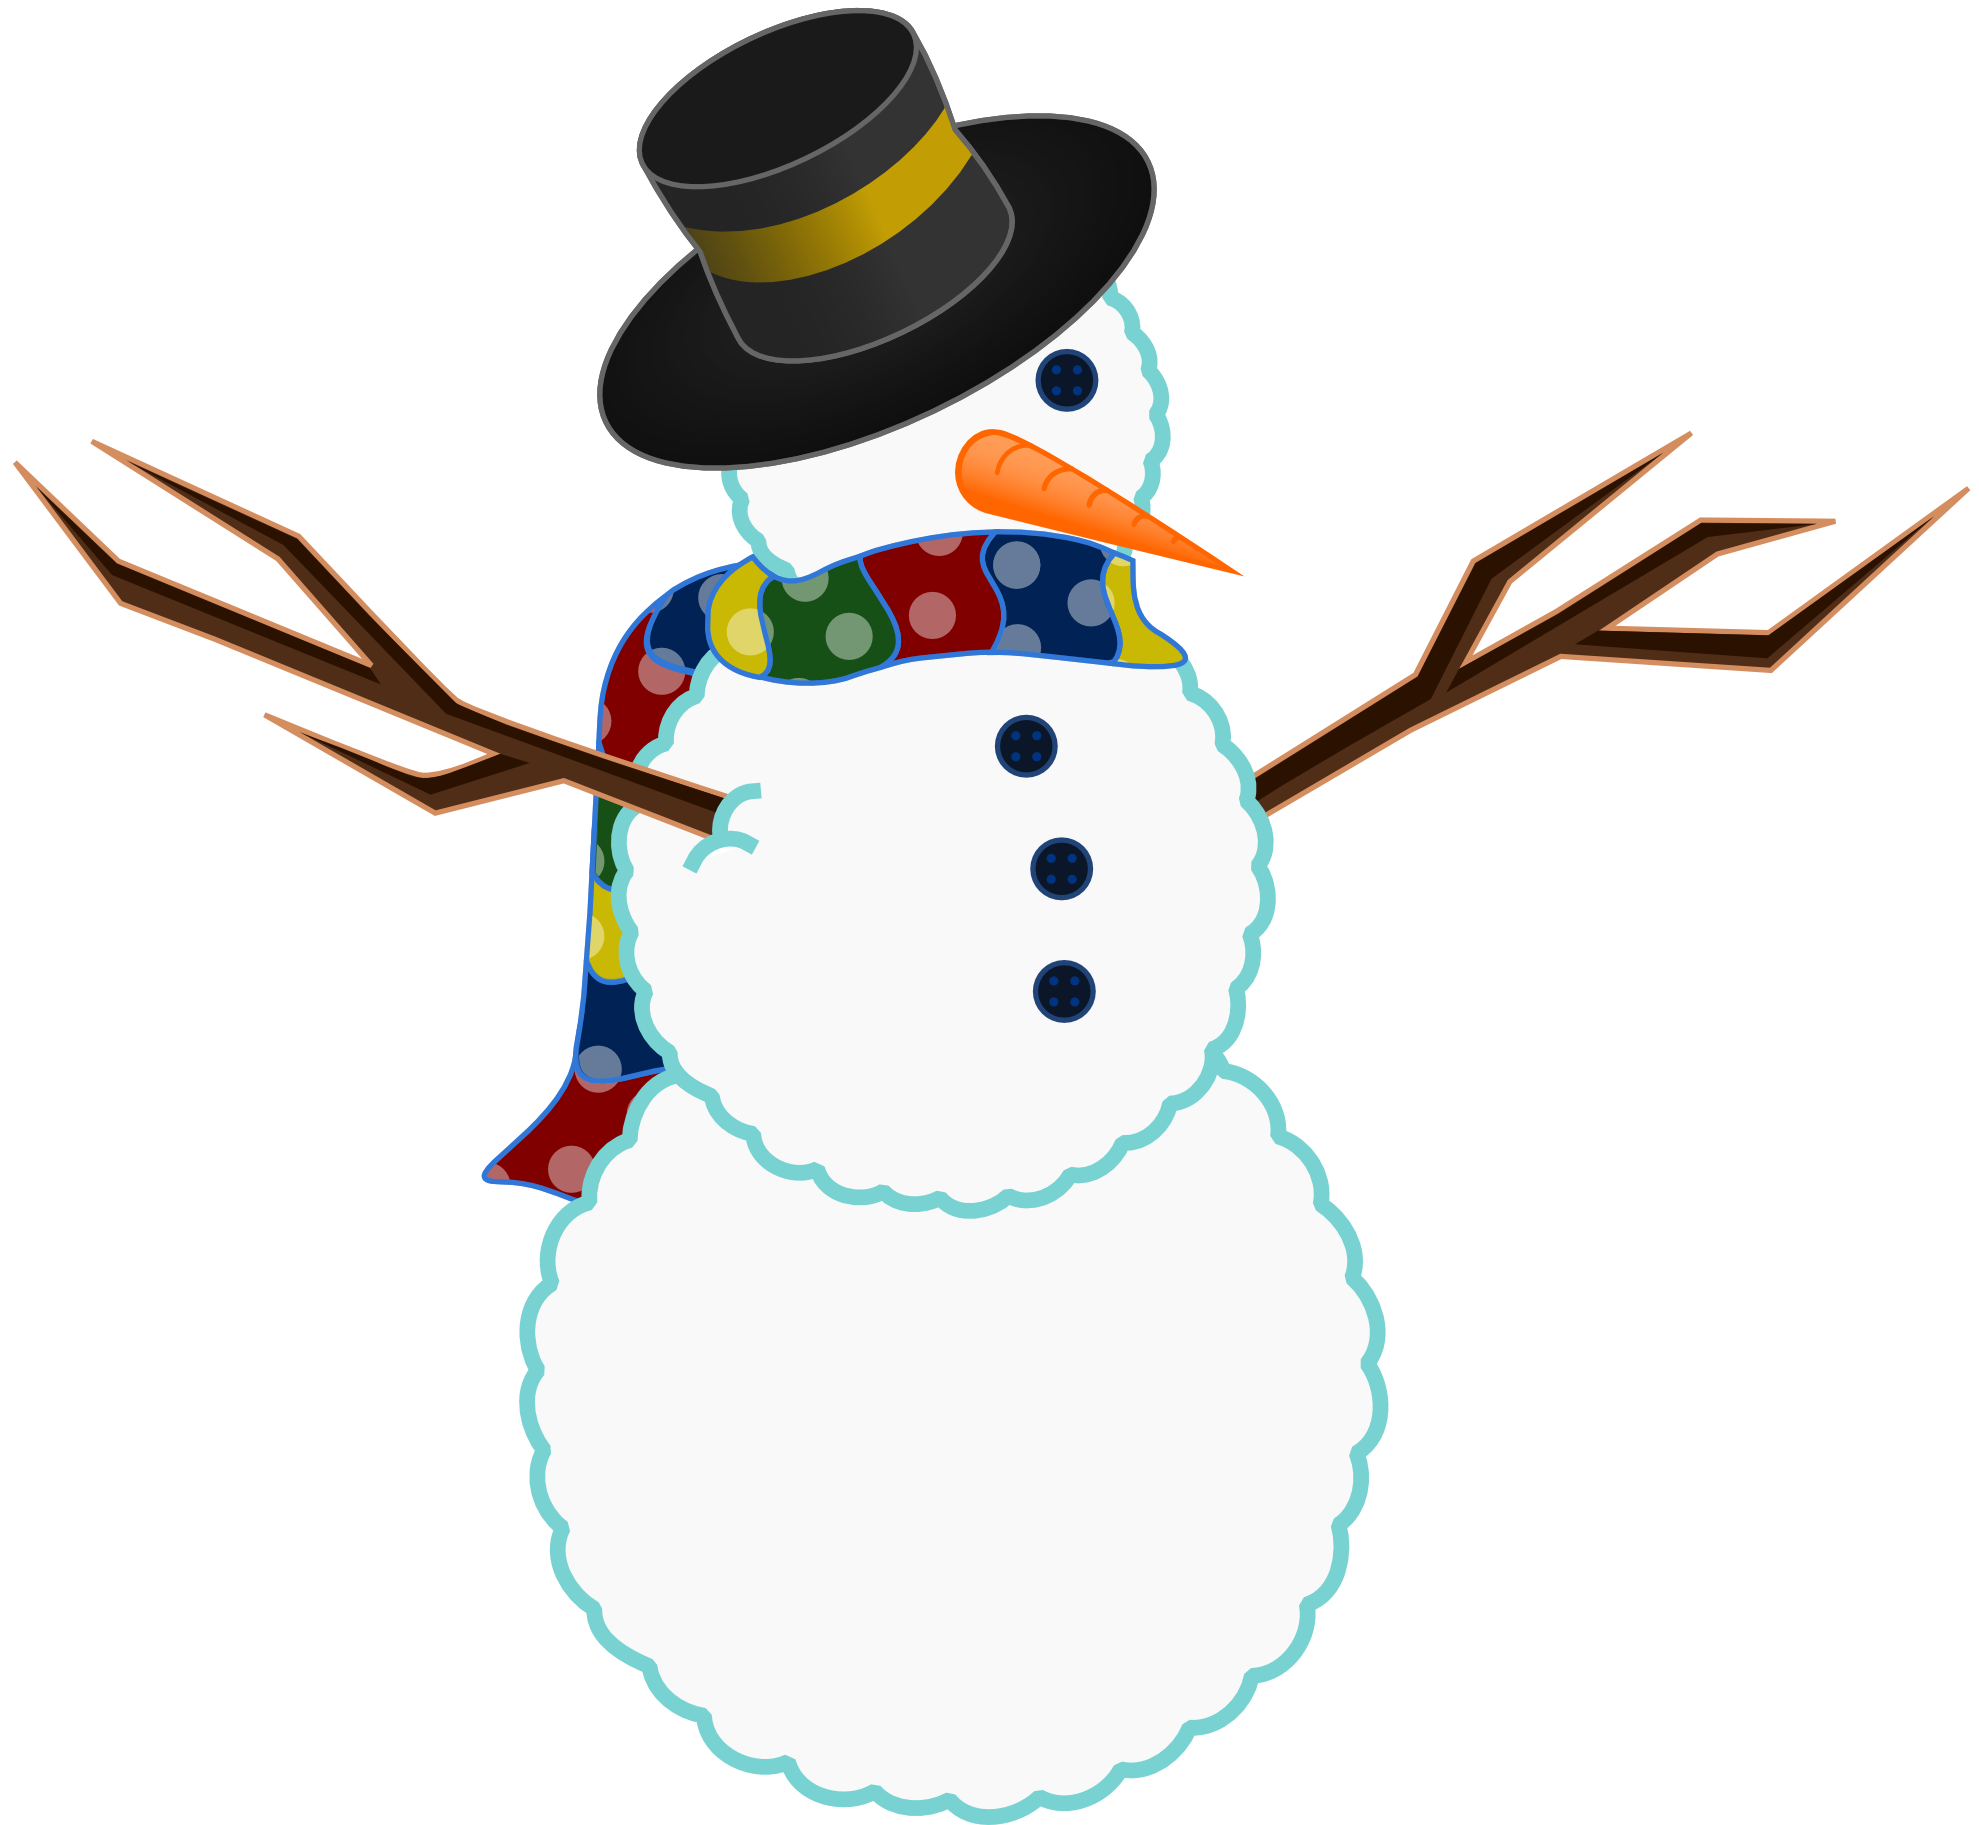 Snowman book clipart clipart transparent library clipartist.net » Clip Art » a scarfed snowman christmas xmas peace ... clipart transparent library